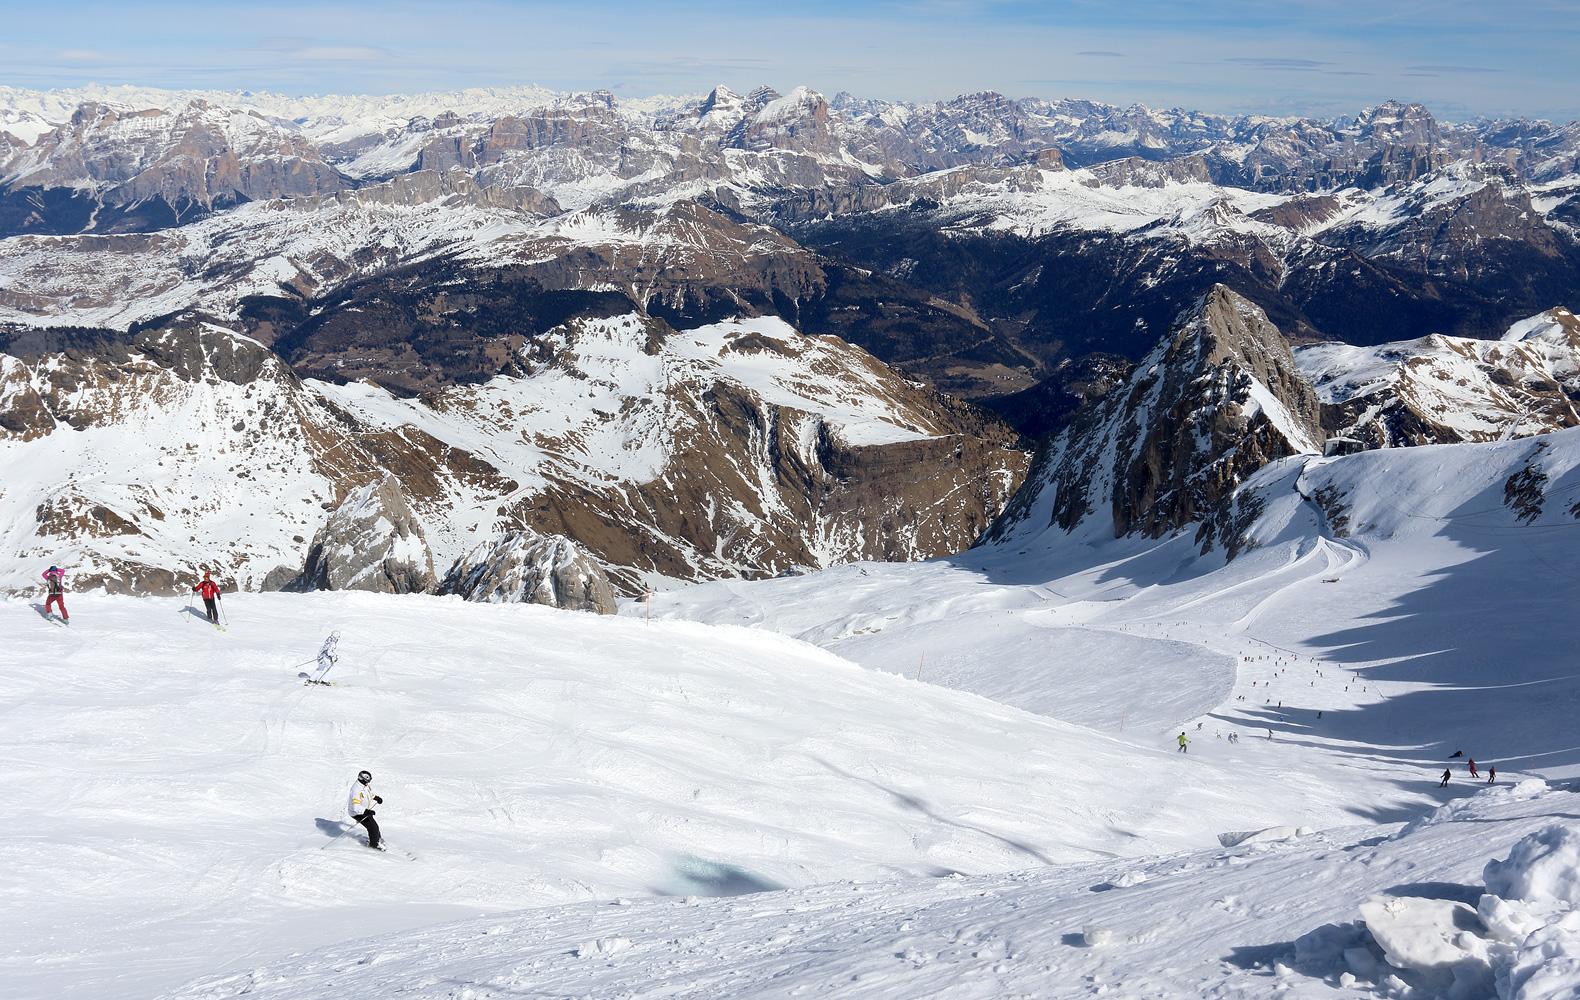 Bremer Ski-Club e.V. - Skireisen und Sportangebote in Bremen